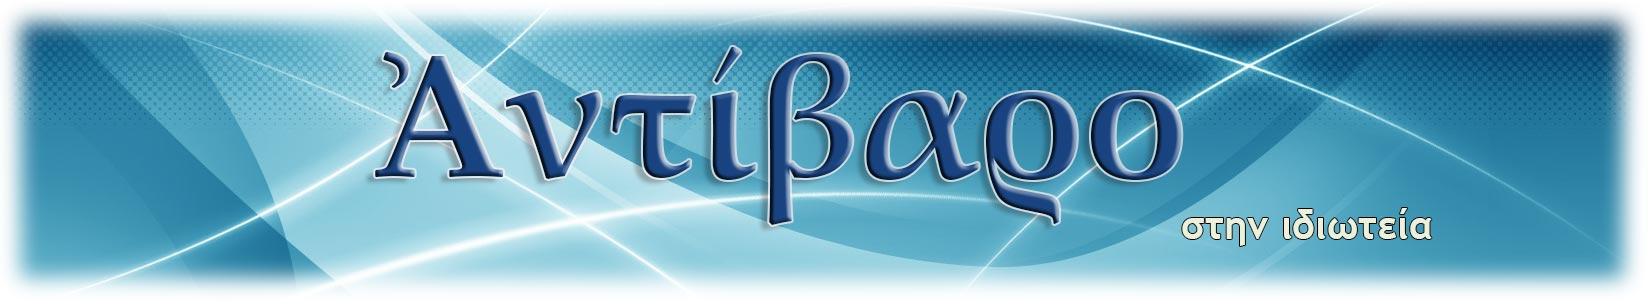 antibaro_logo_29-04-16